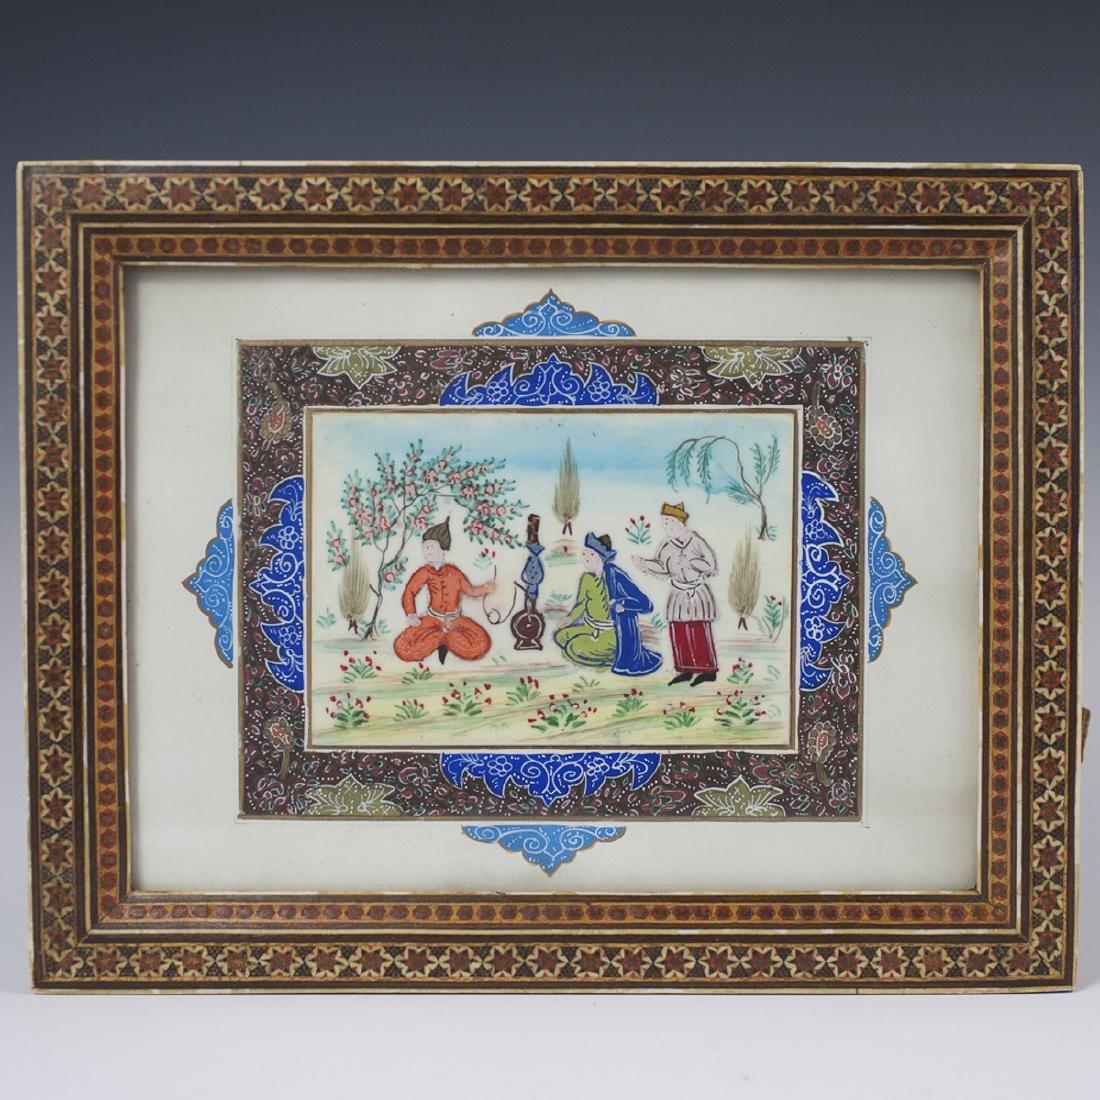 Persian Painting on Bone